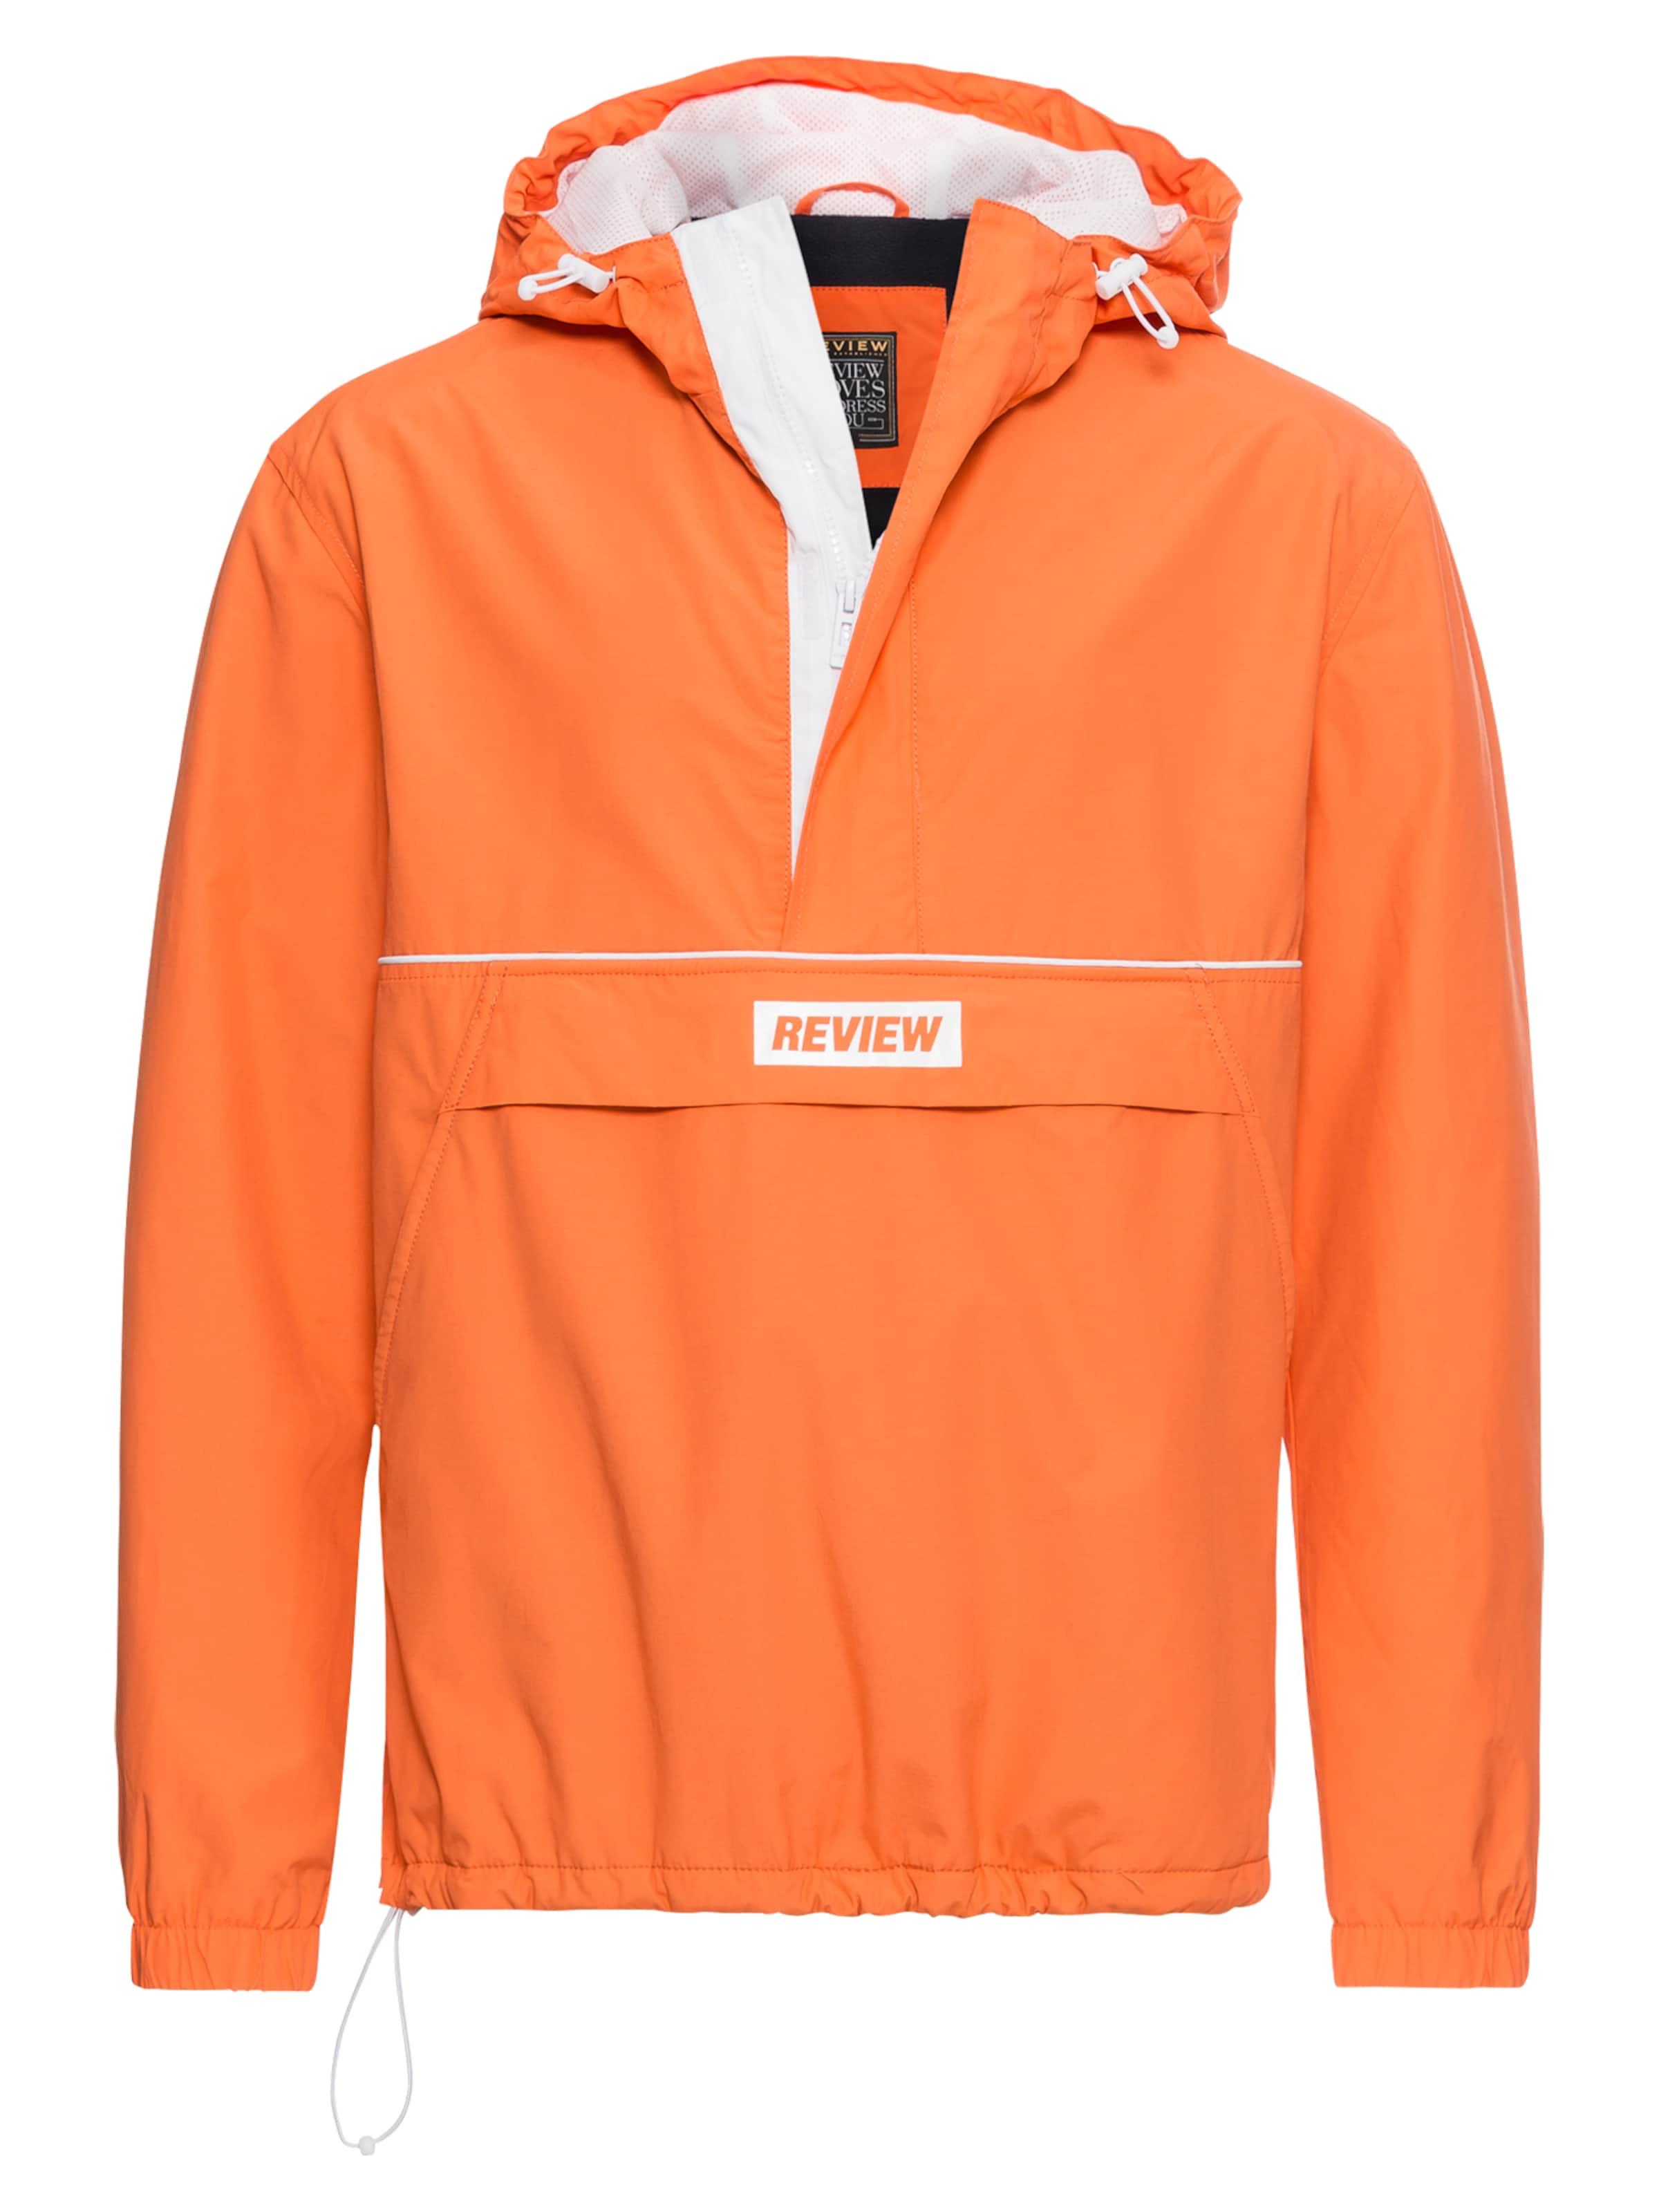 Review Herren Übergangsjacke WNDBRKR OVERHEAD orange | 04060479310358